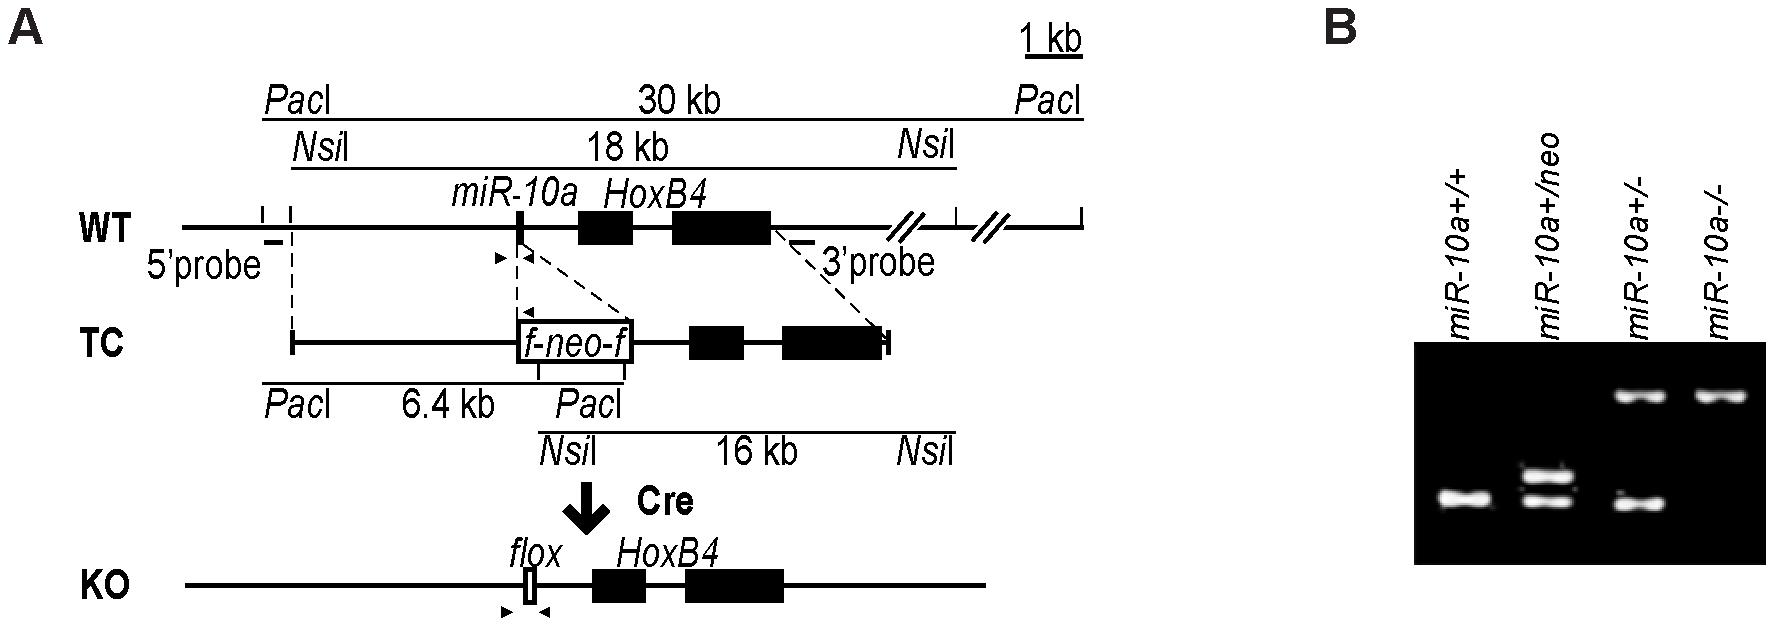 Generation of <i>miR-10a</i> KO mice.